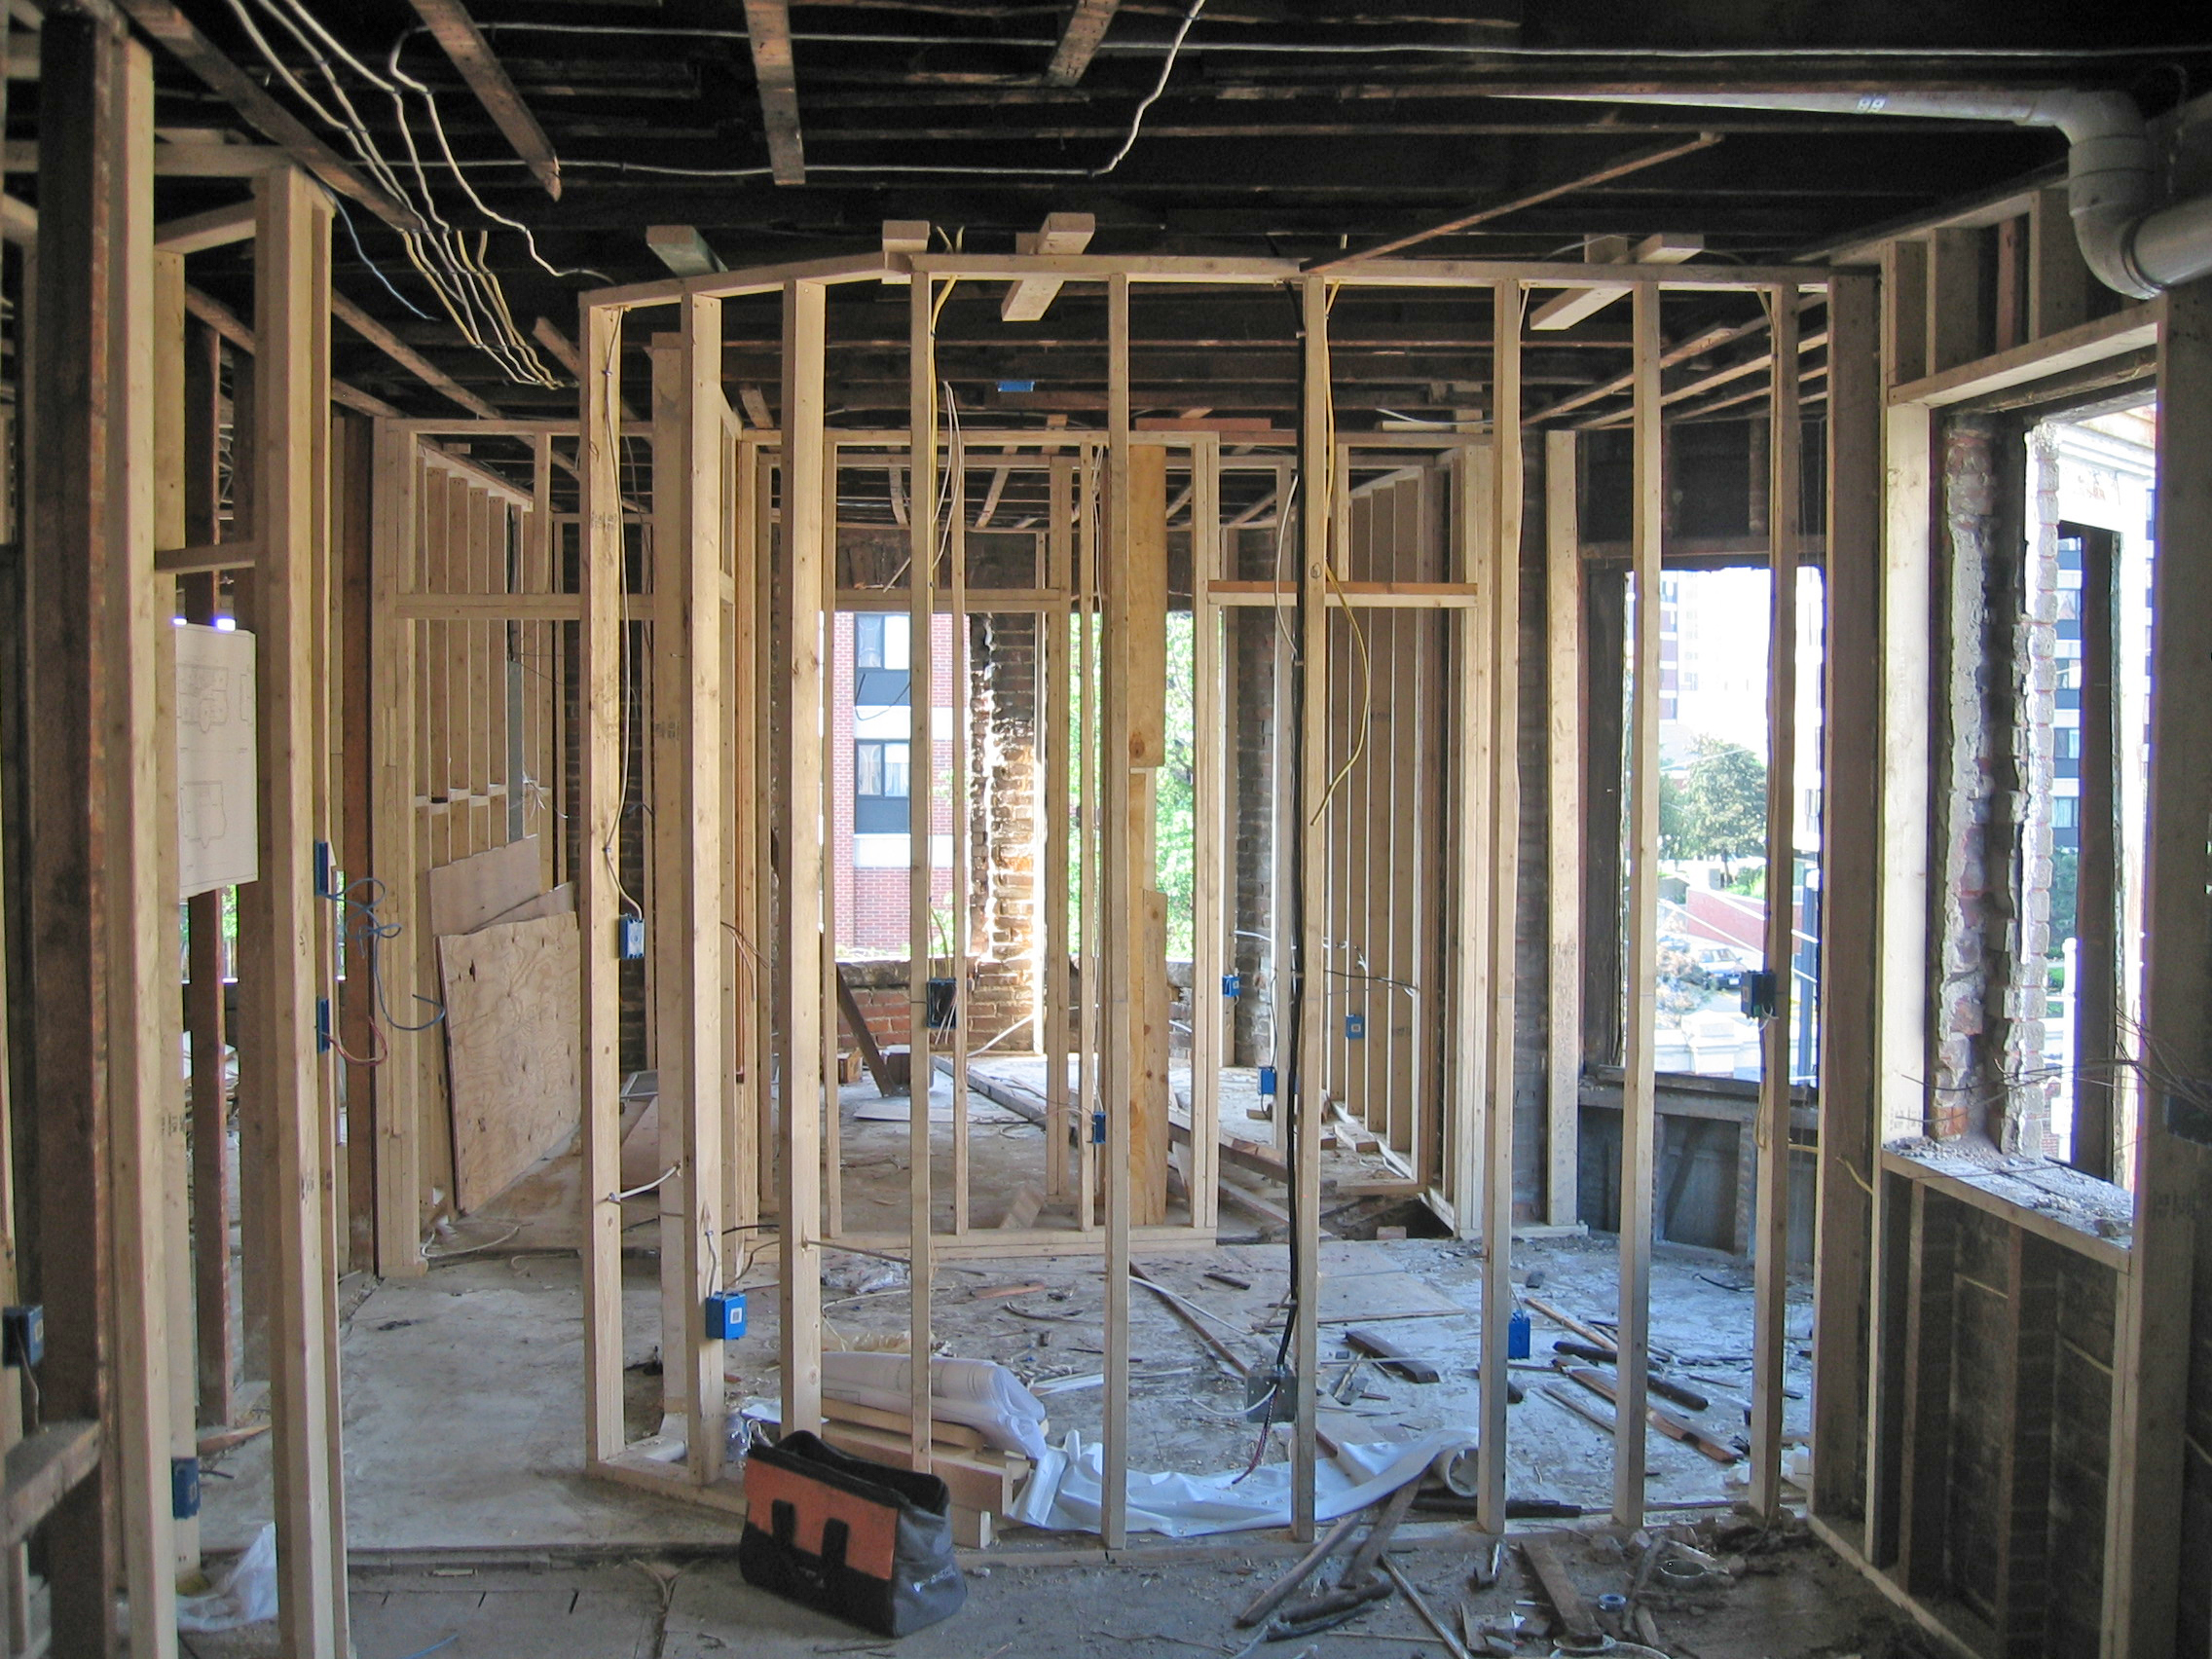 836 Huntington Ave Construction Photo 01.JPG